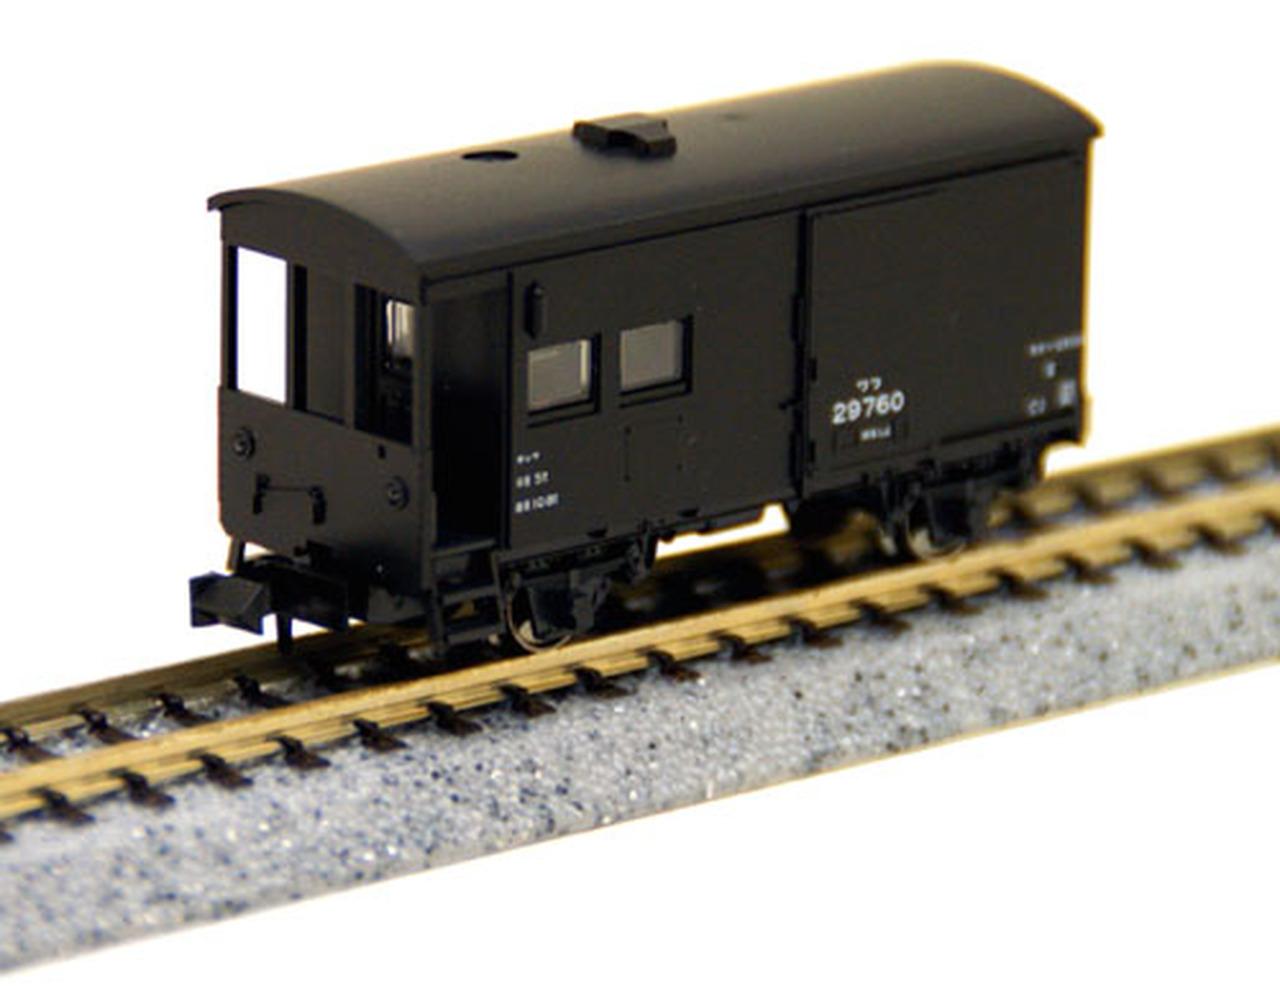 N Scale - Kato - 8030 - Caboose, WAFU 29500 - Japanese National Railways - 29760